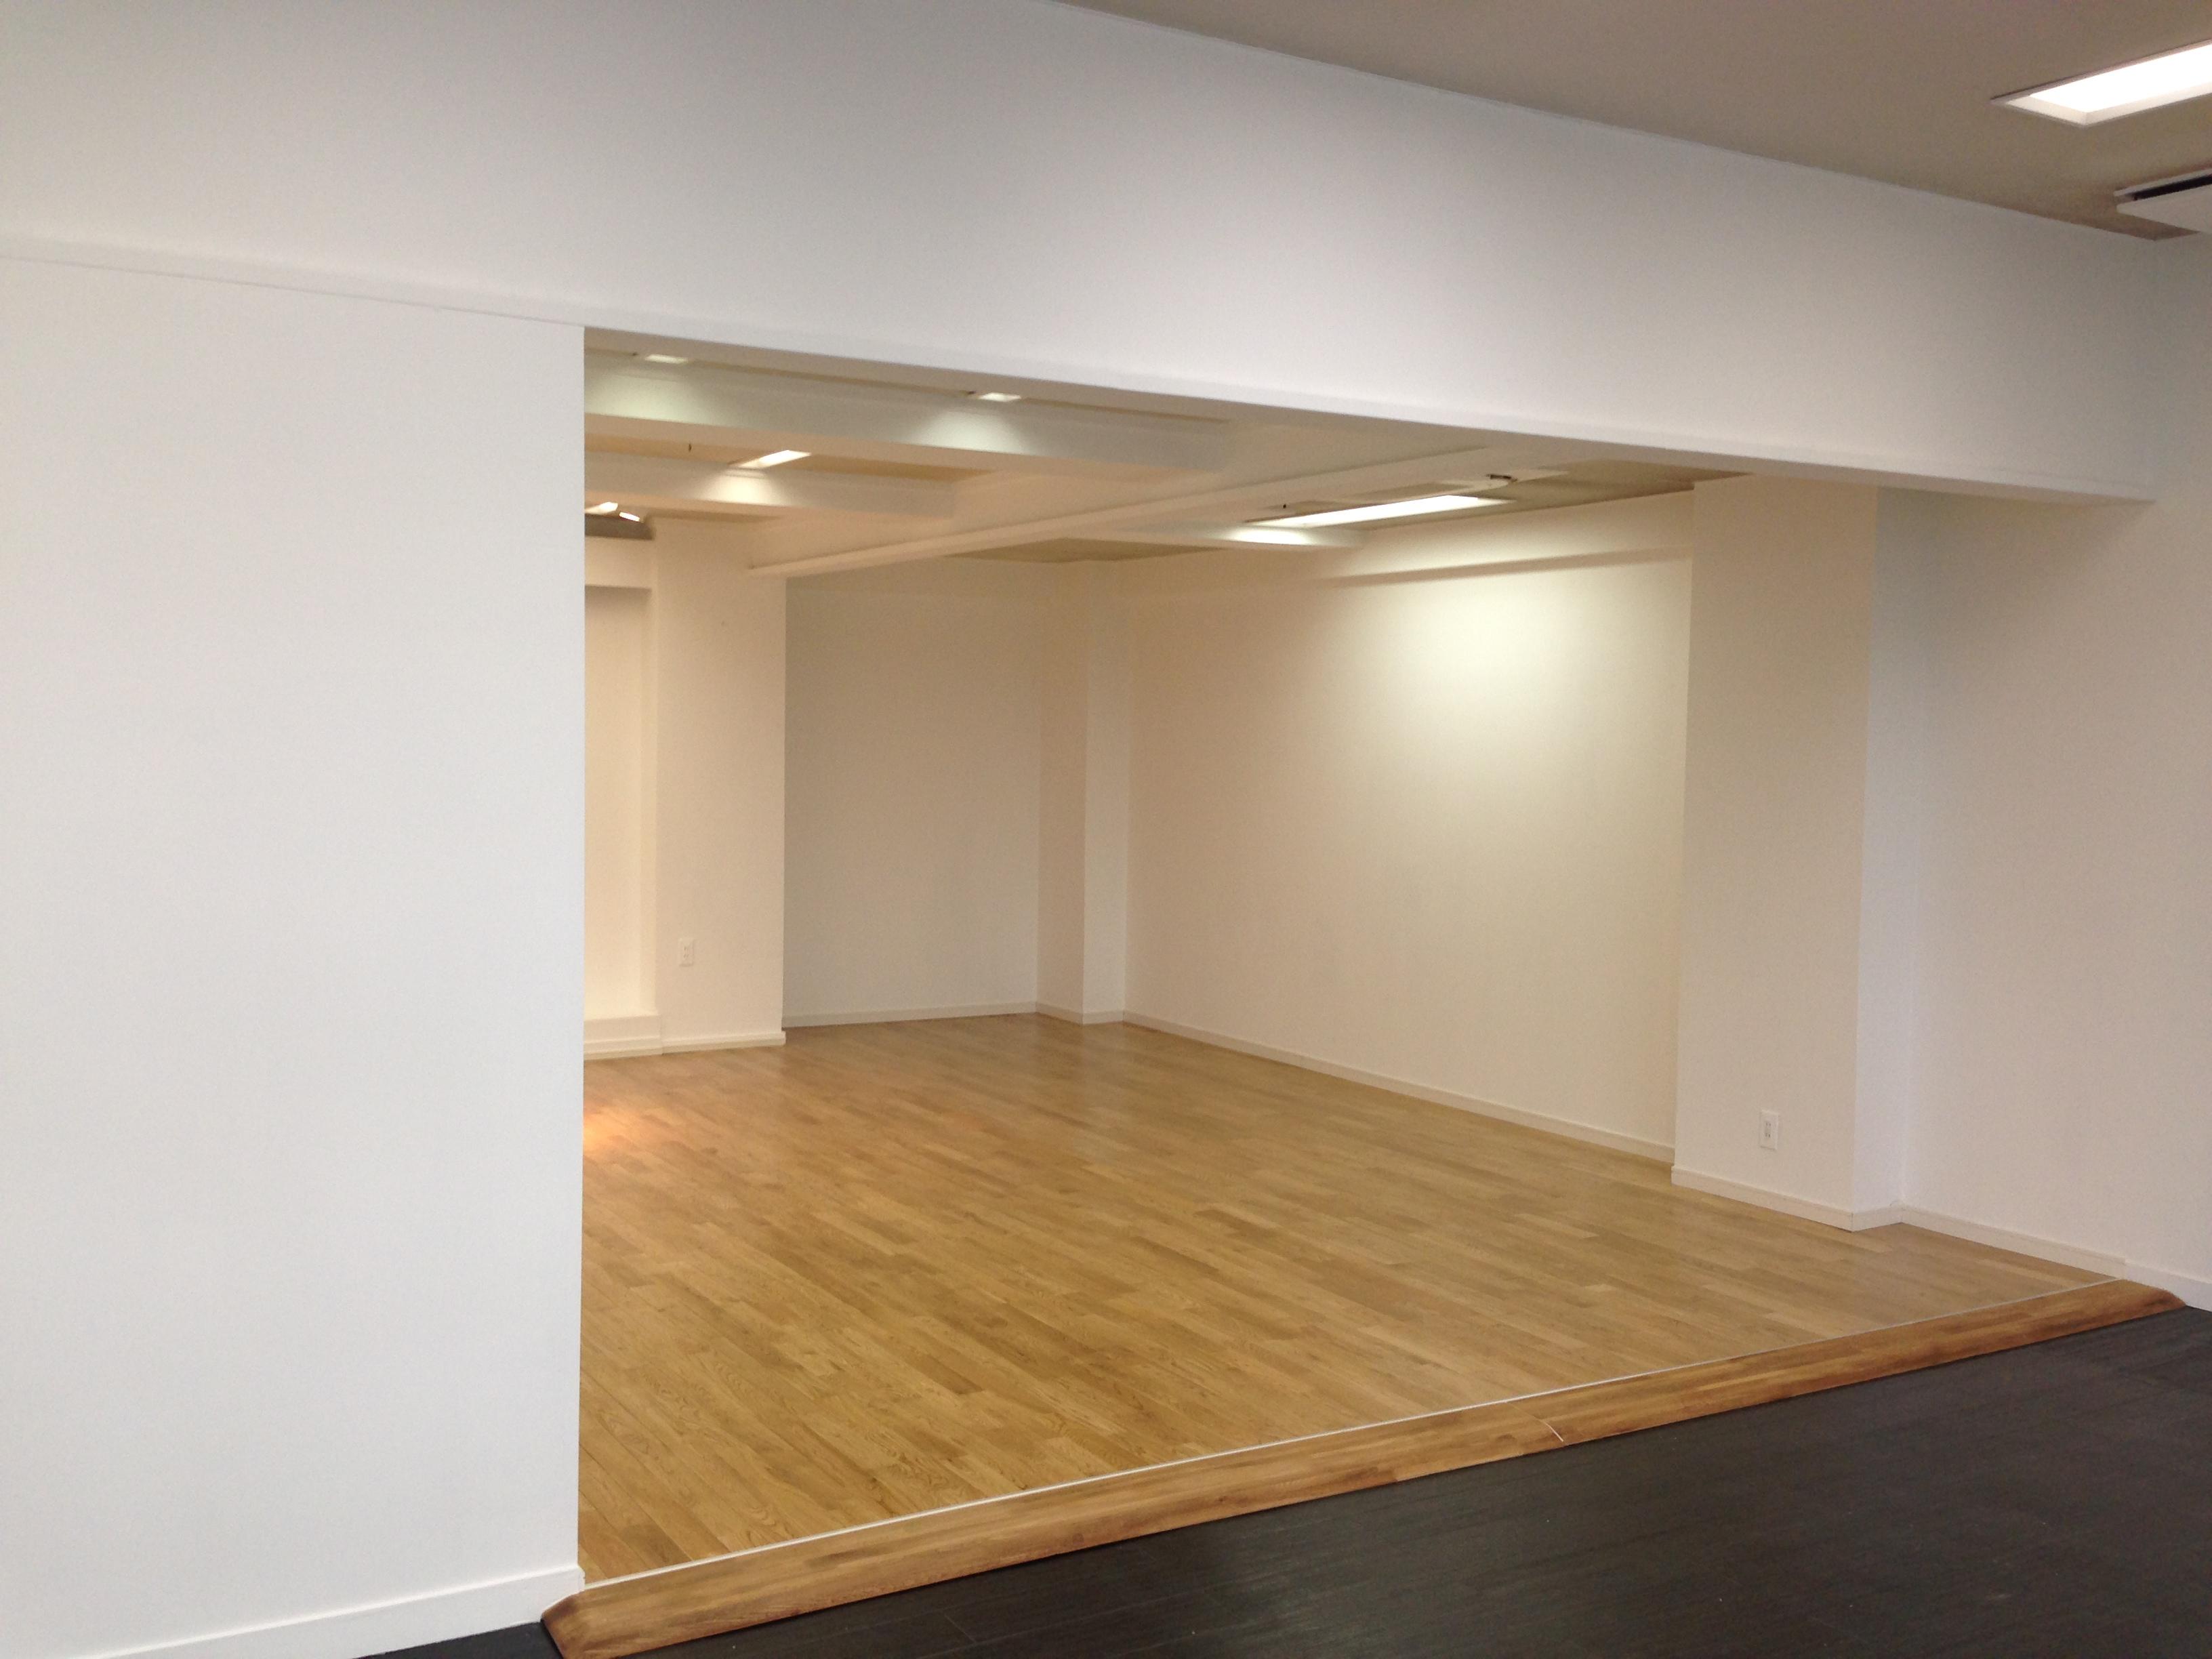 Tsukuba Fine Art Gallery